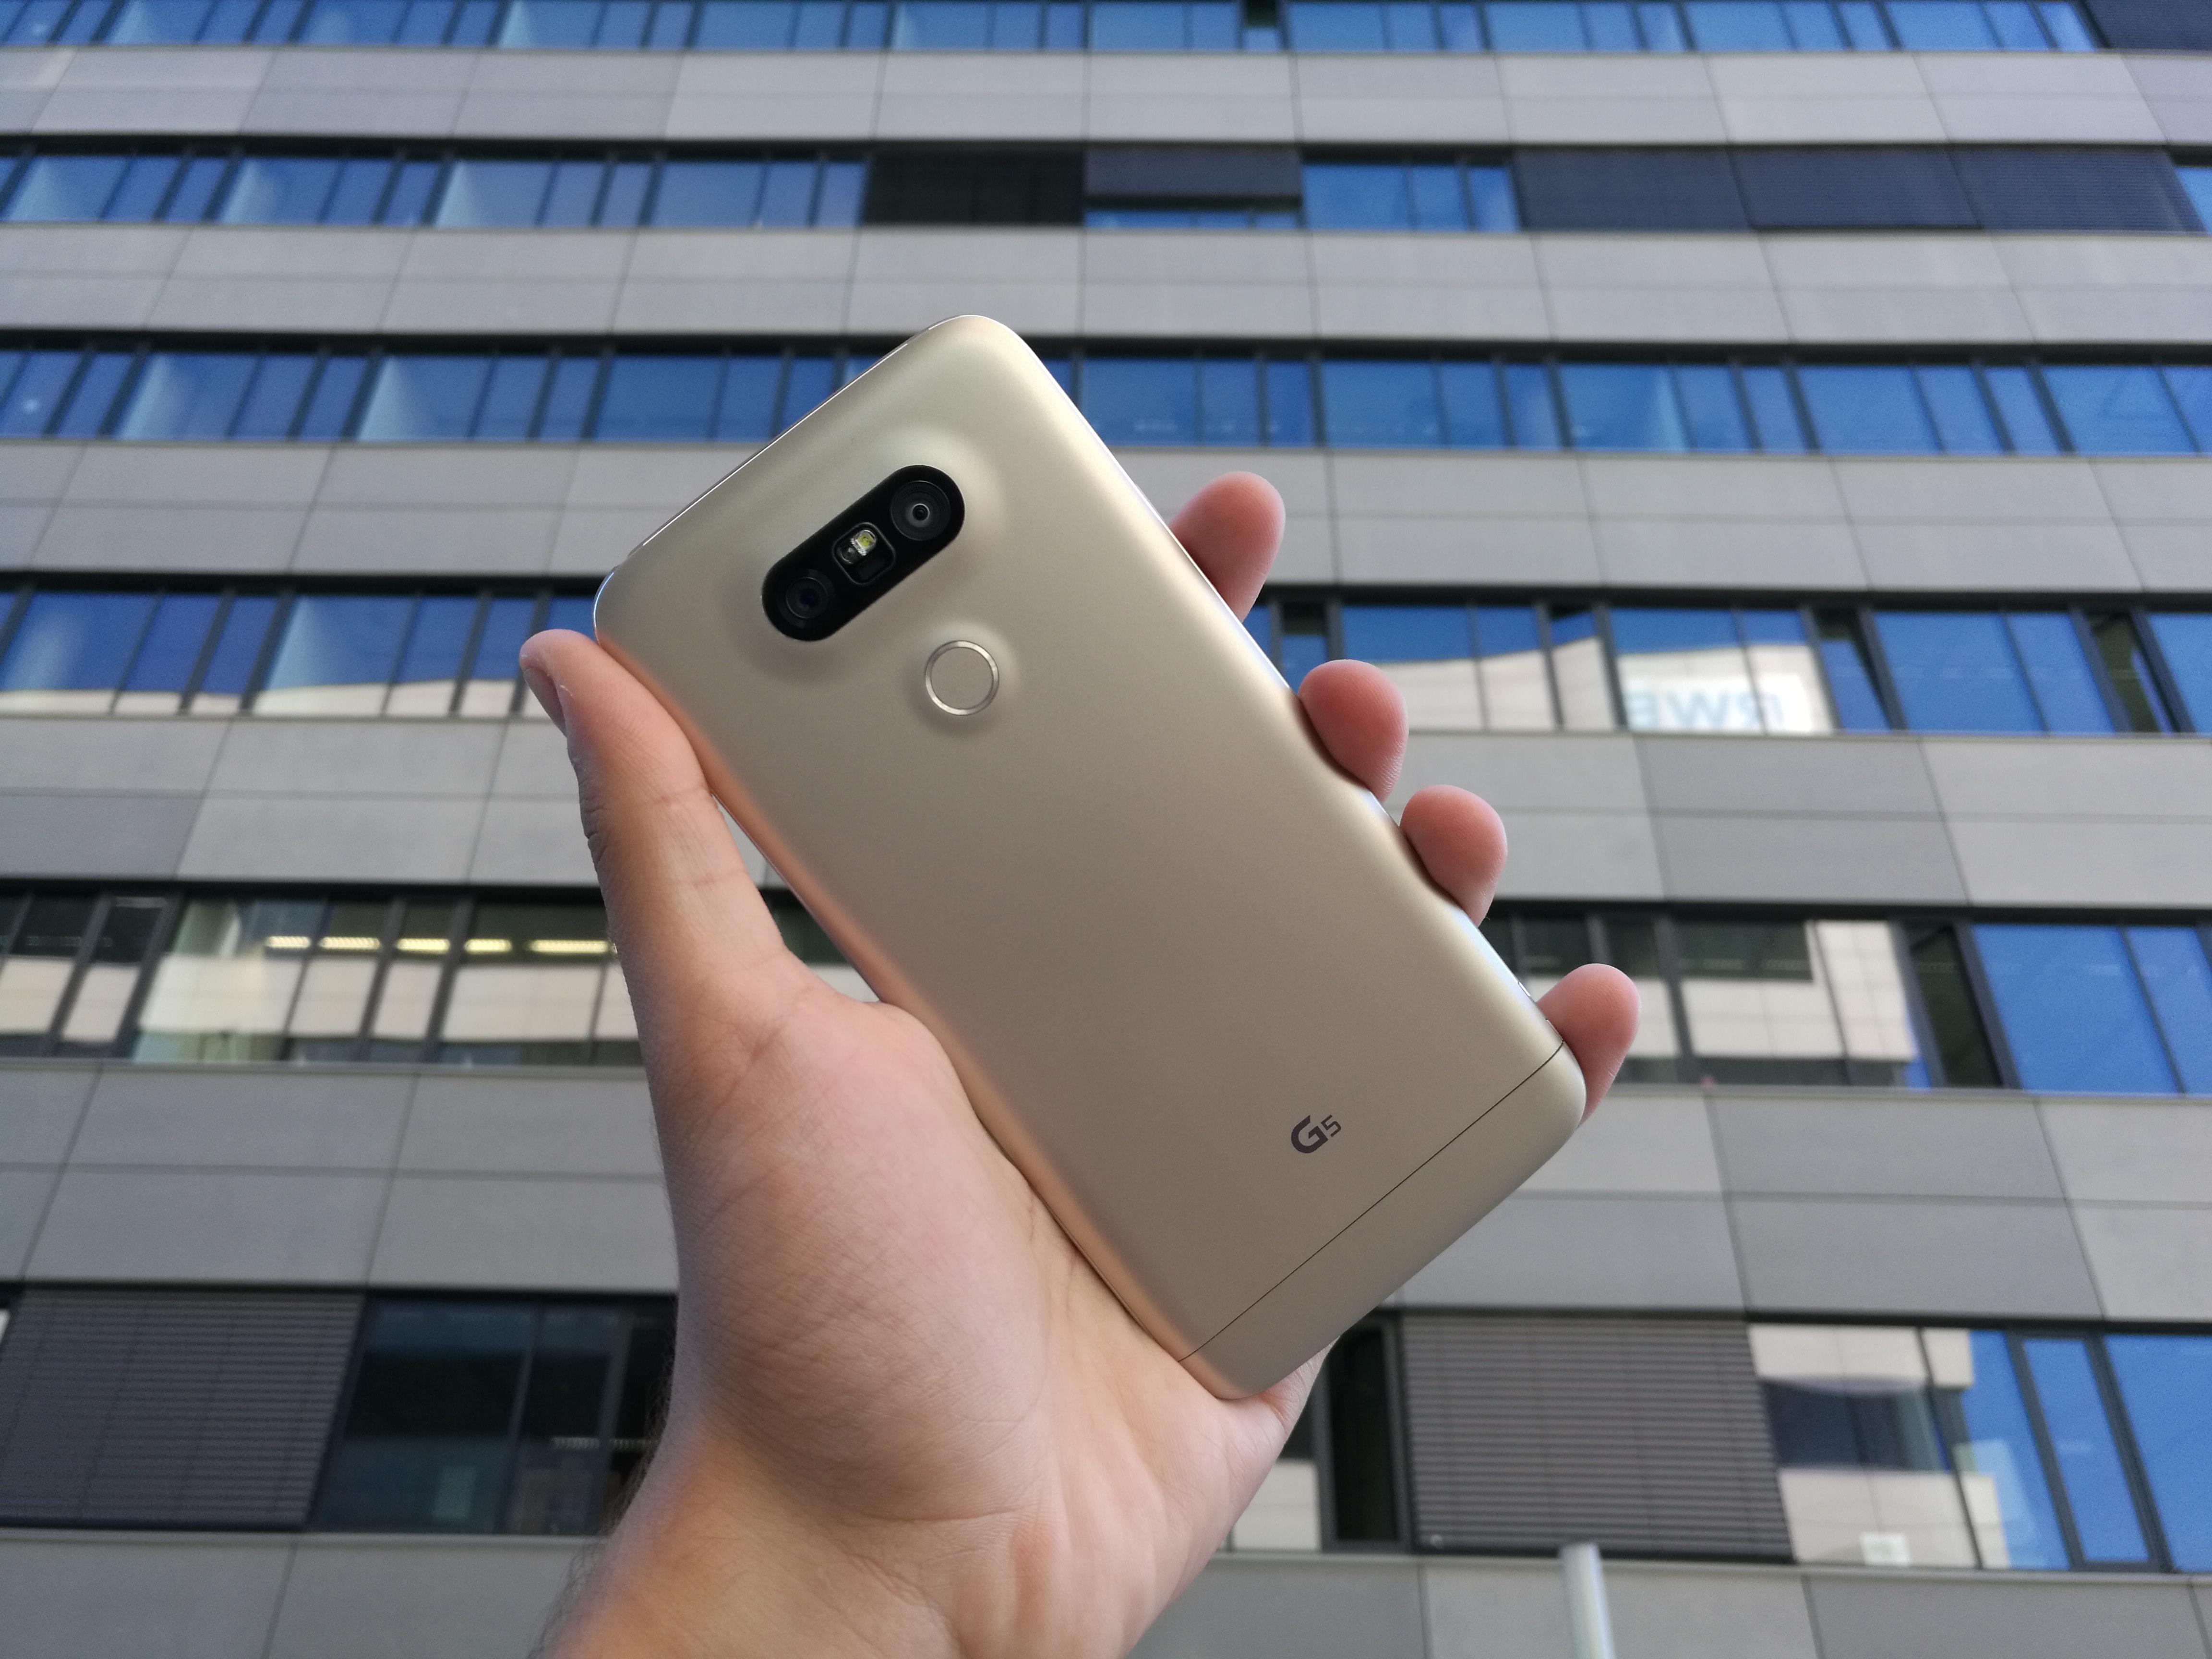 Ochutnávky #31 – LG G5